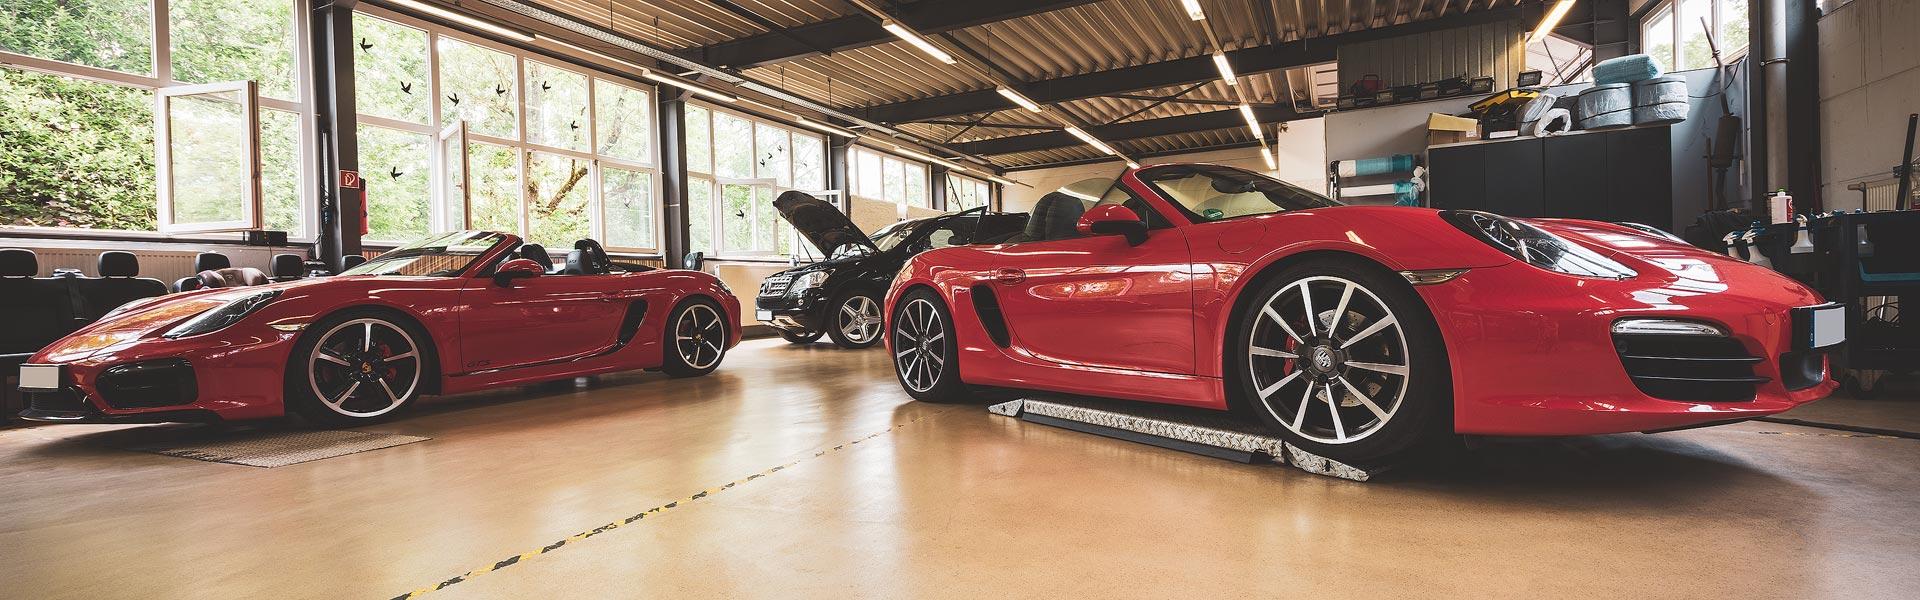 Porsche-&-Mercedes_50_1920x600px